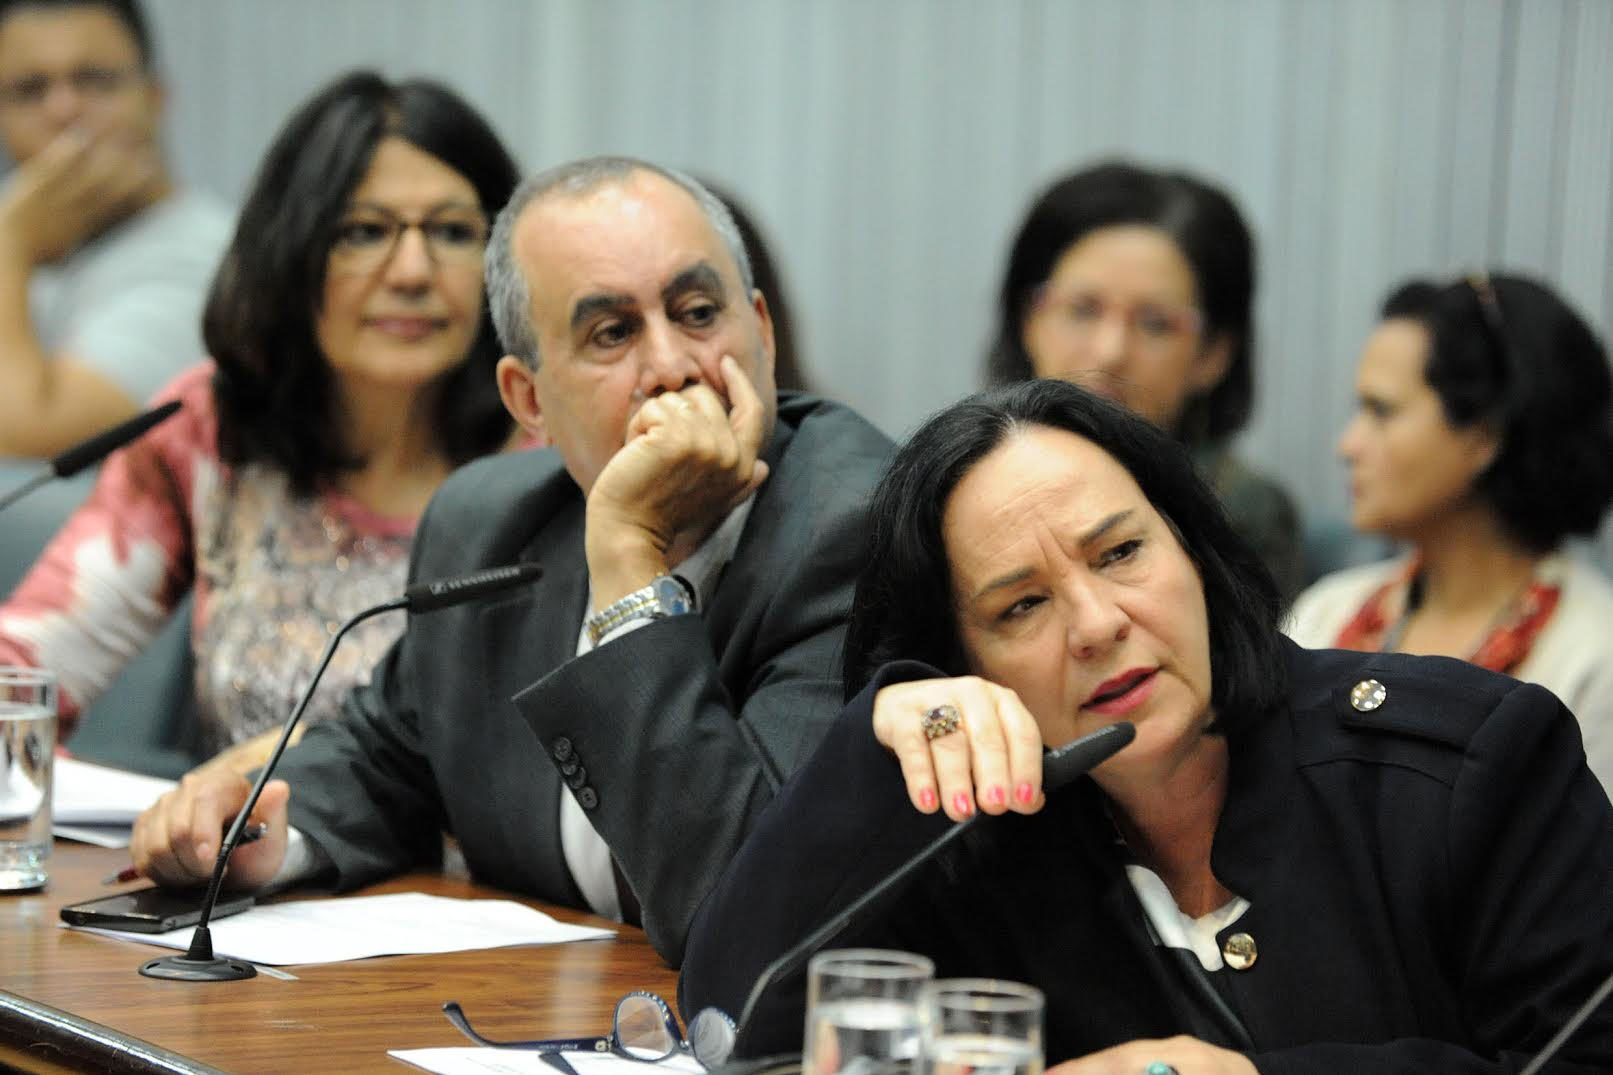 Marcia Lia (à dir.)<a style='float:right' href='https://www3.al.sp.gov.br/repositorio/noticia/N-06-2017/fg203783.jpg' target=_blank><img src='/_img/material-file-download-white.png' width='14px' alt='Clique para baixar a imagem'></a>